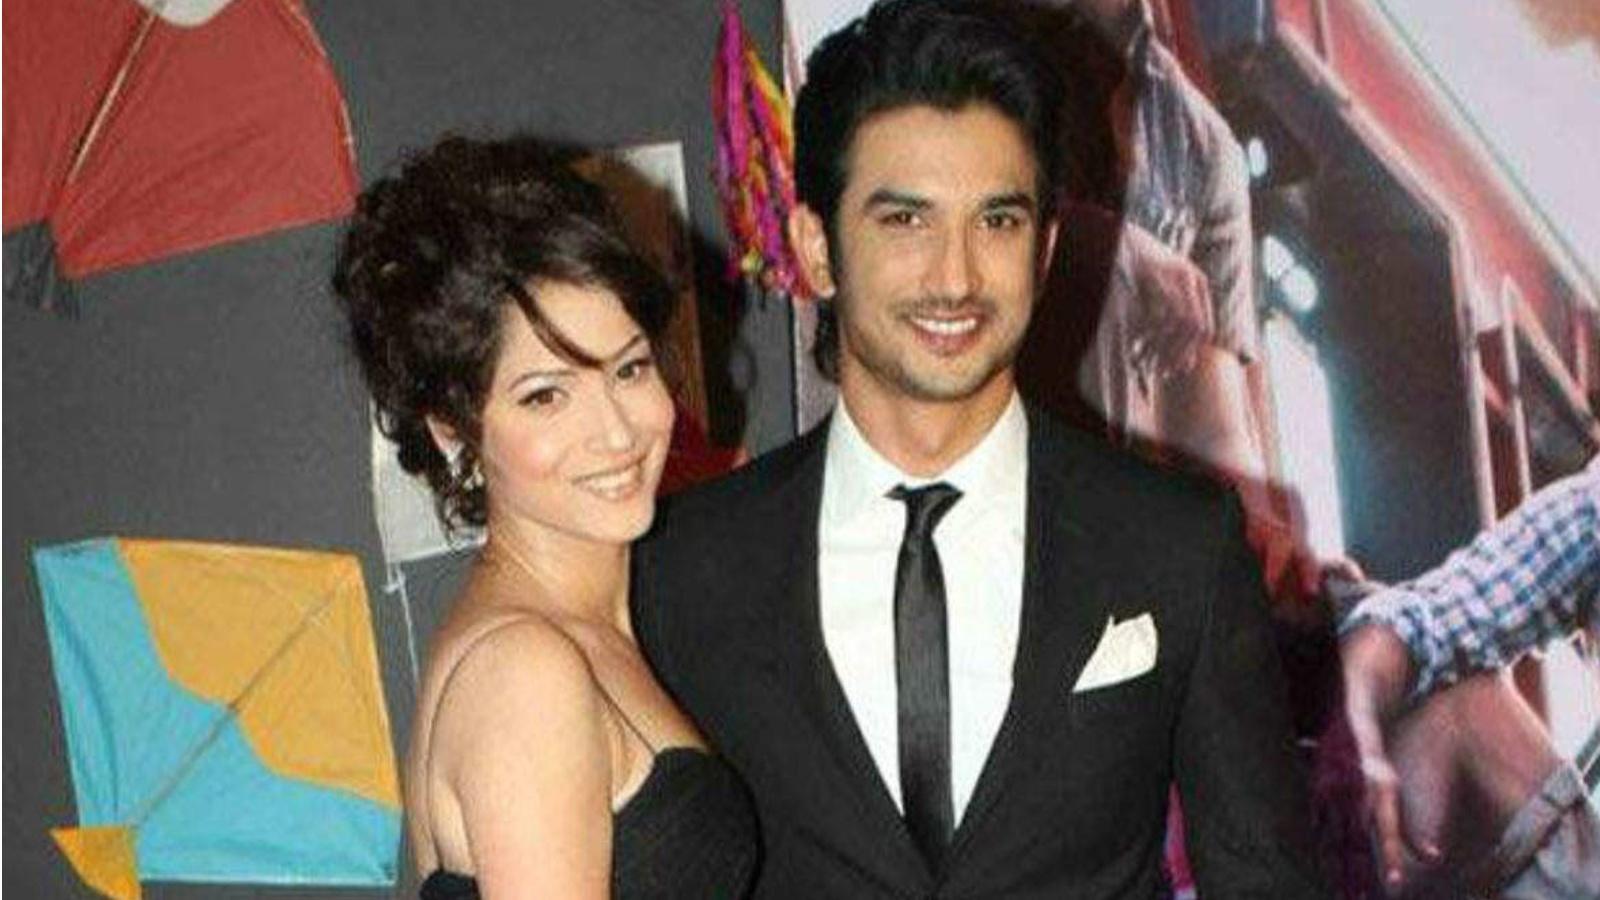 ankita-lokhande-calls-sushant-singh-rajput-her-favourite-co-star